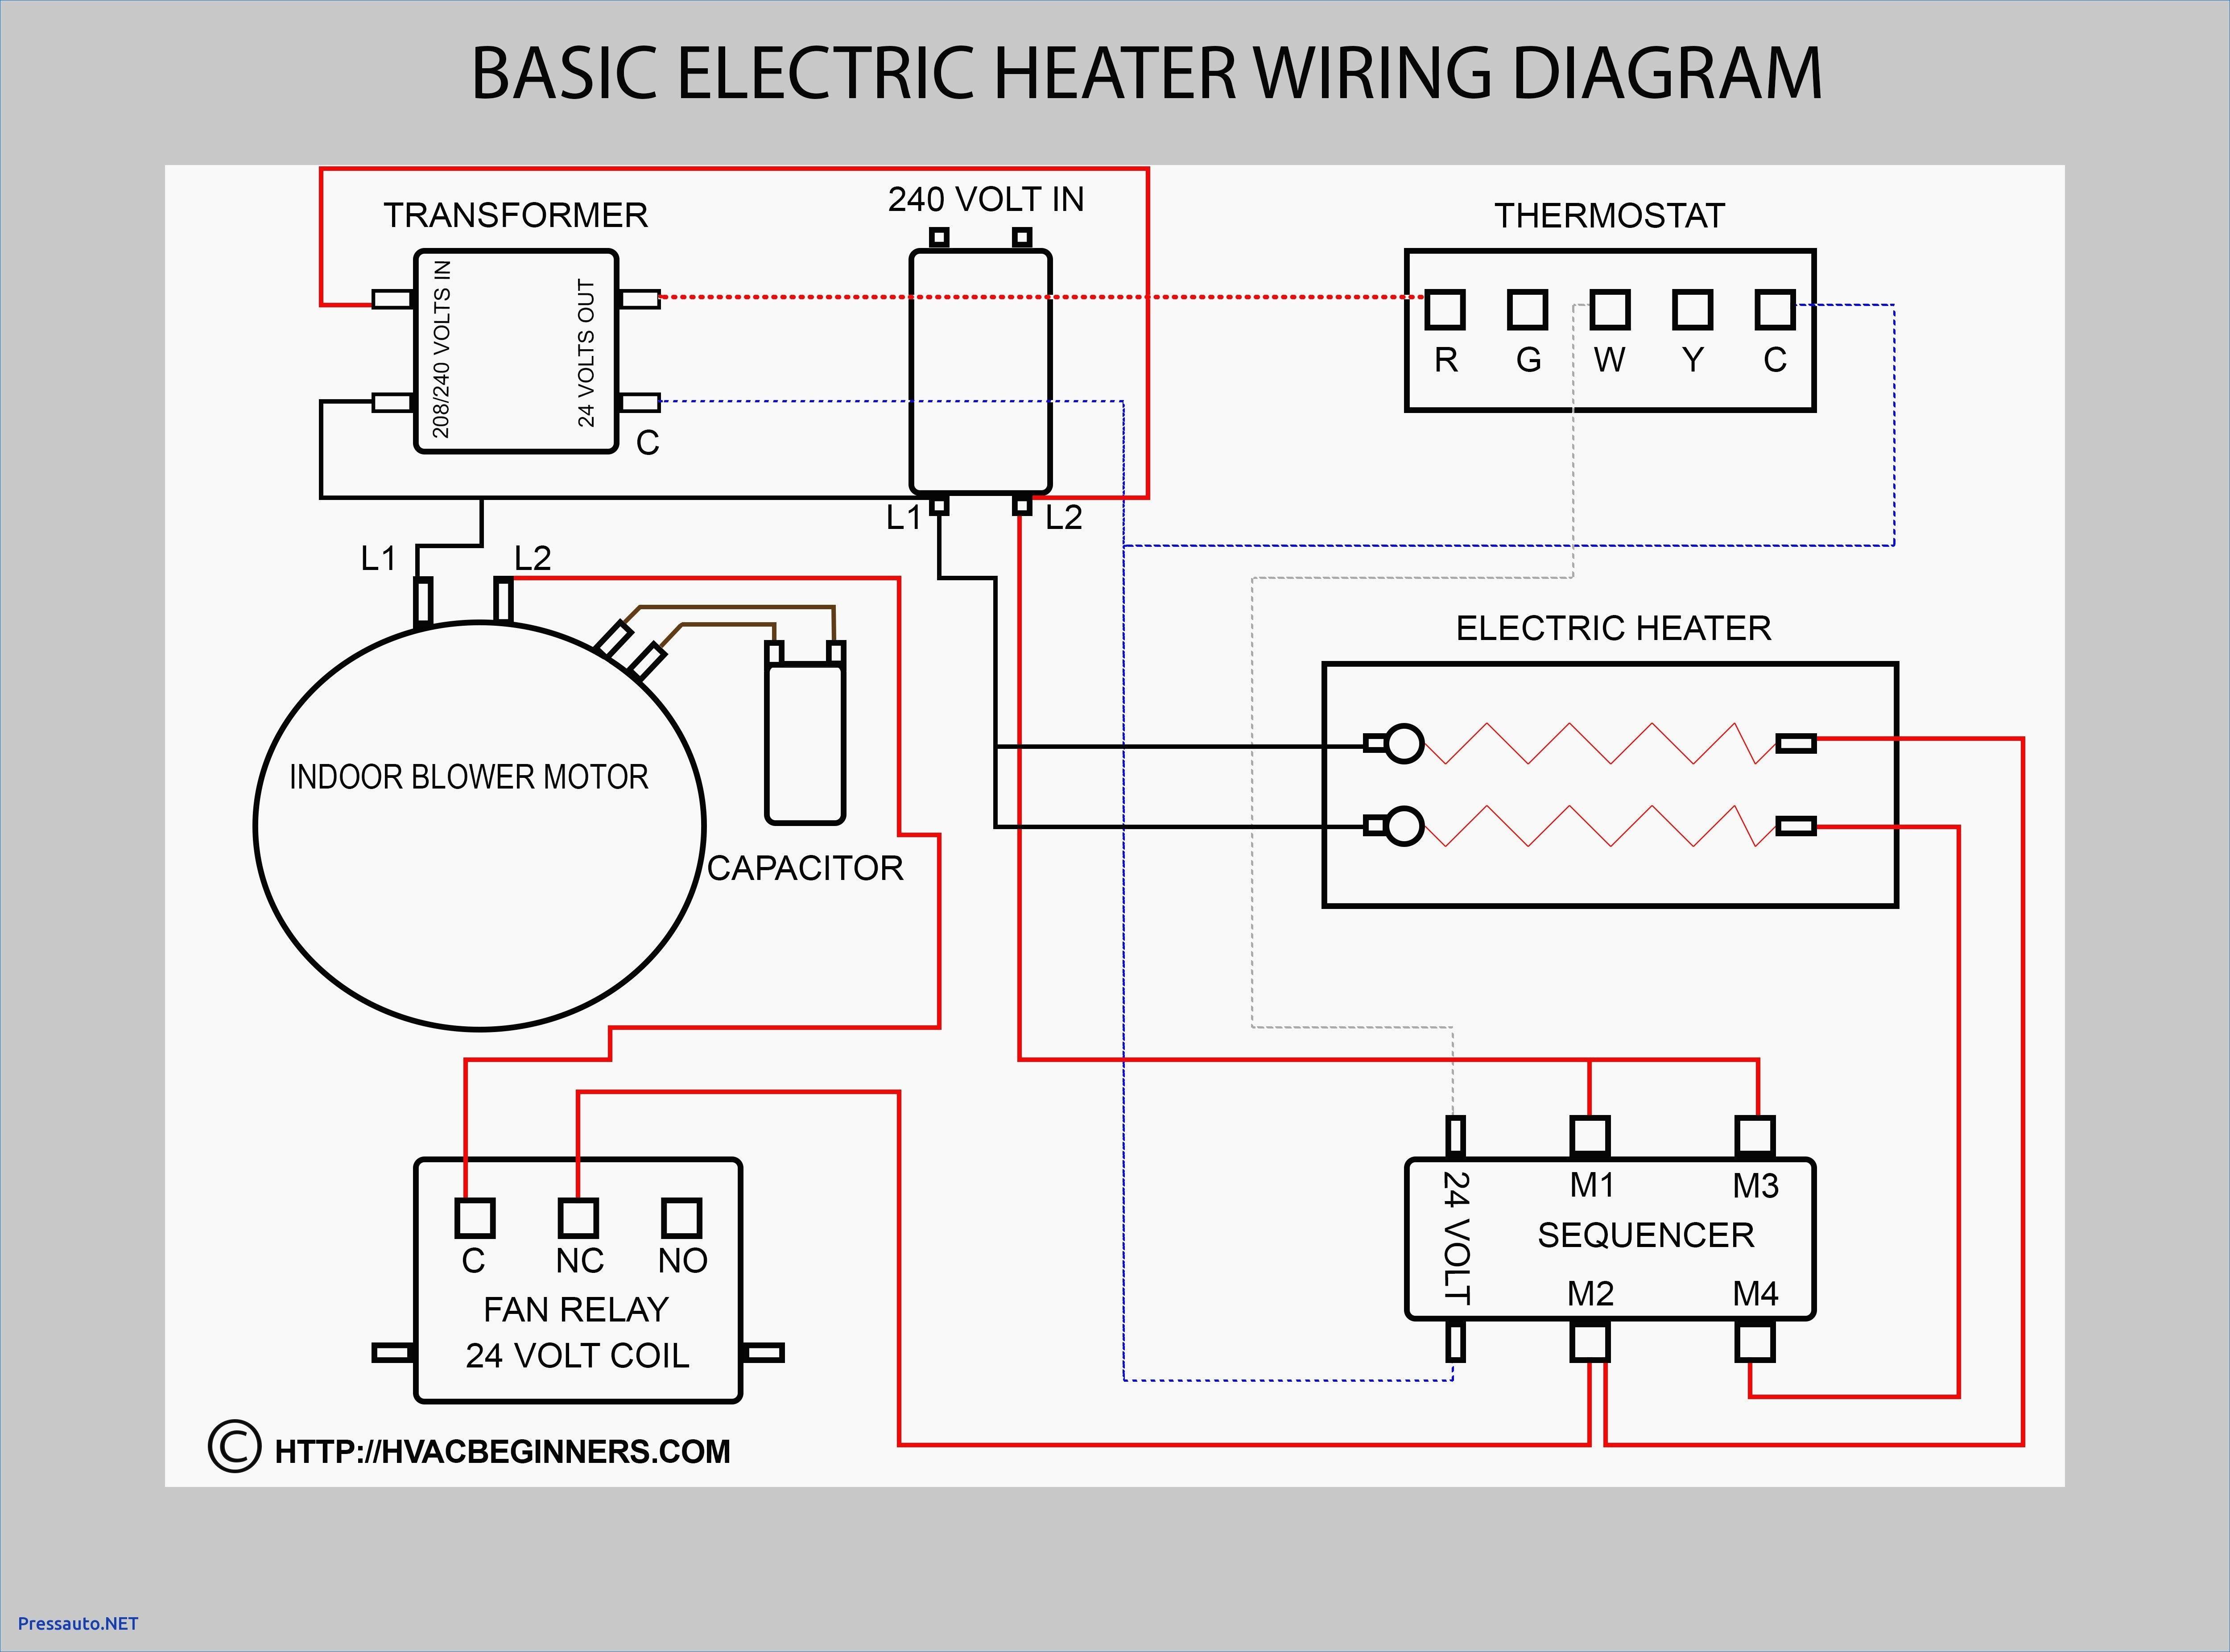 Luxury Wiring Diagram For A Y Plan Heating System Diagrams Digramssample Diagramimages Electrical Circuit Diagram Basic Electrical Wiring Electrical Diagram